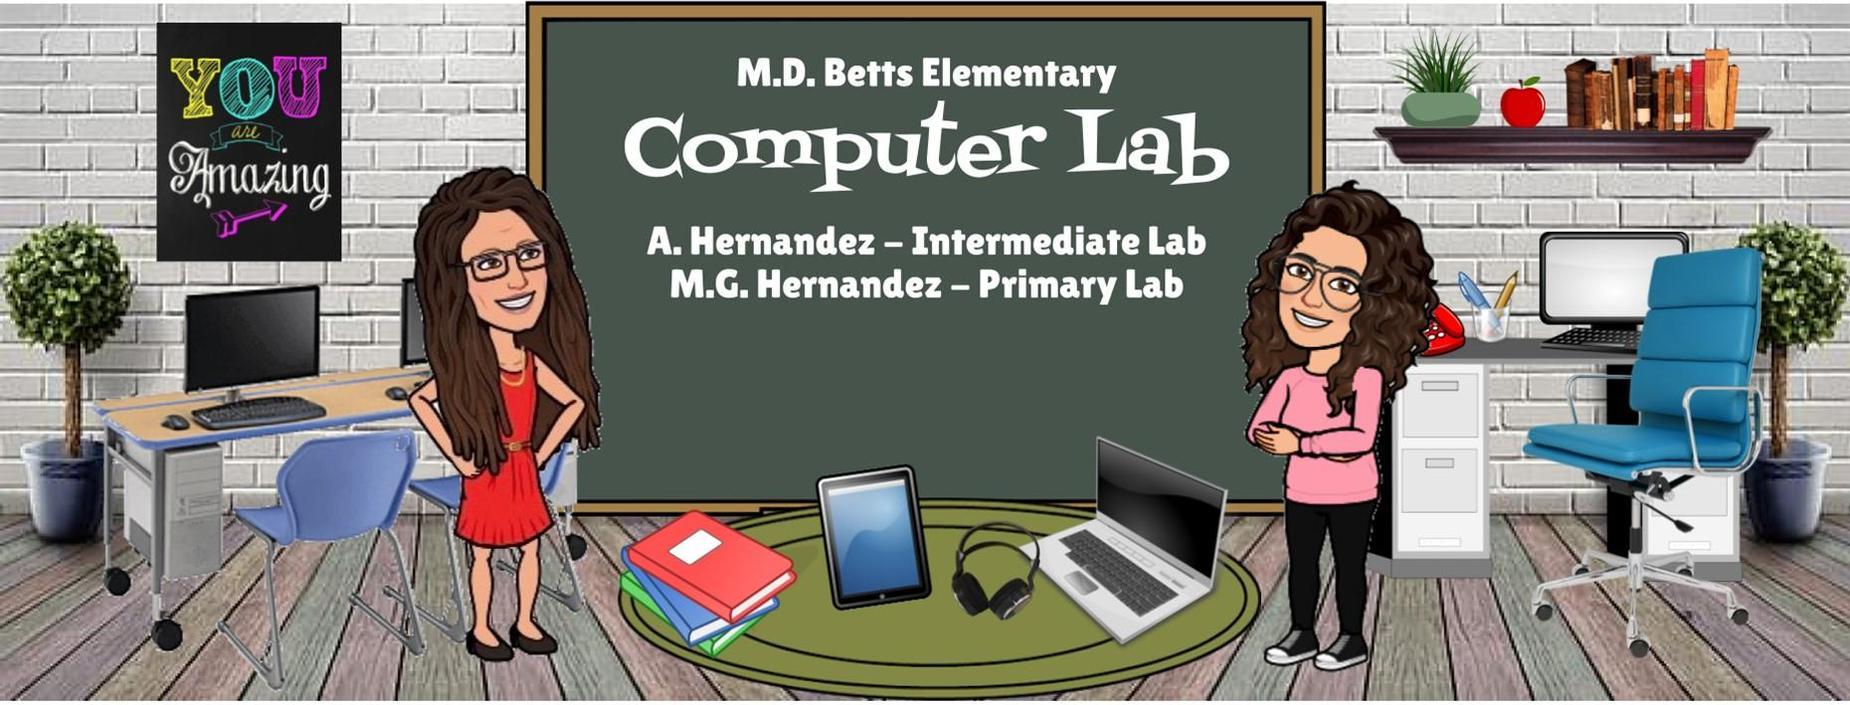 Image of Computer Lab staff